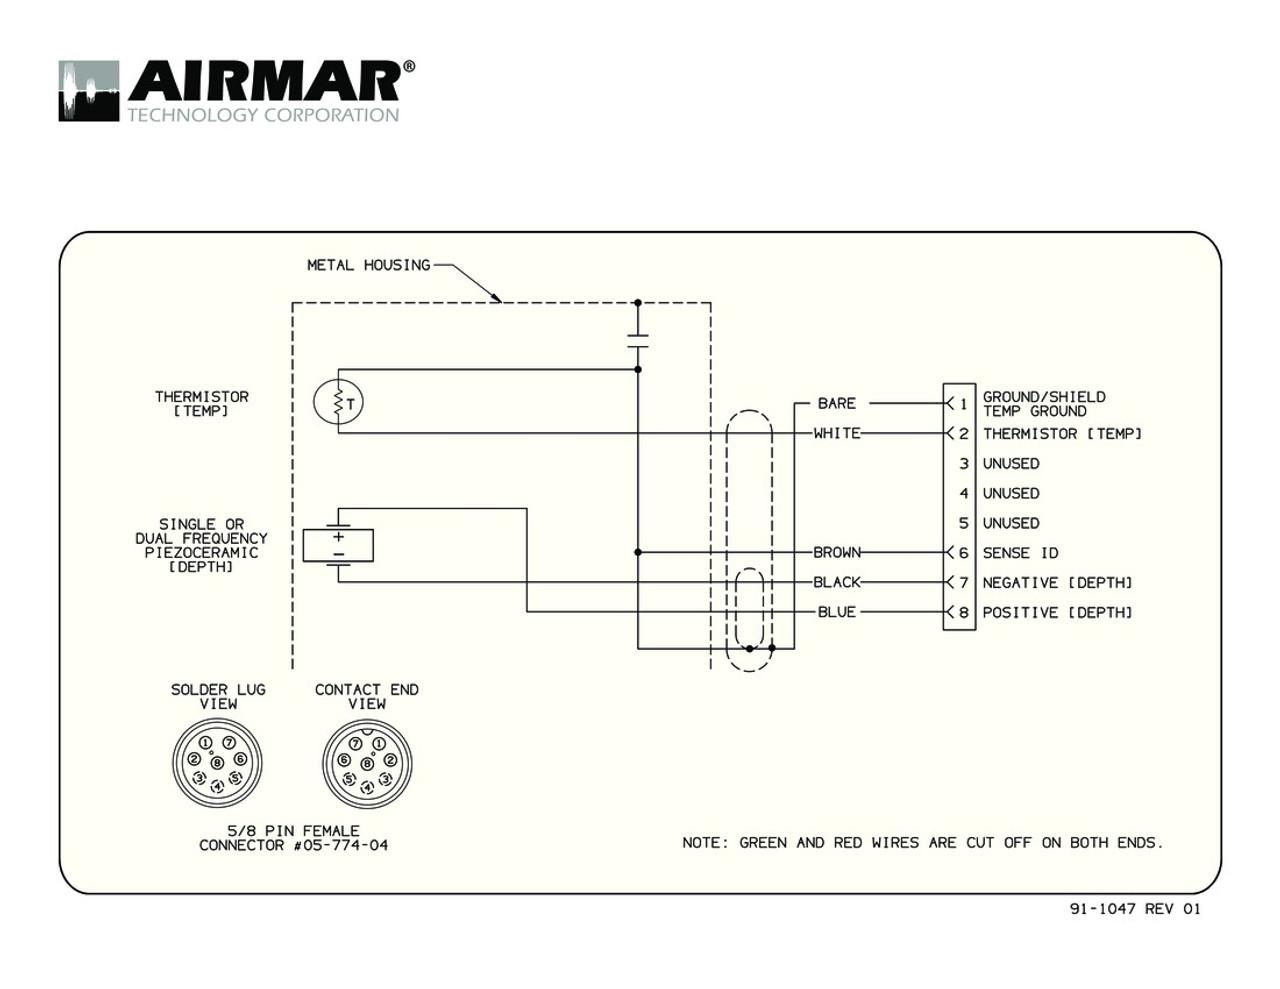 small resolution of garmin power wiring diagram wiring libraryairmar wiring diagram garmin b117 8 pin d t